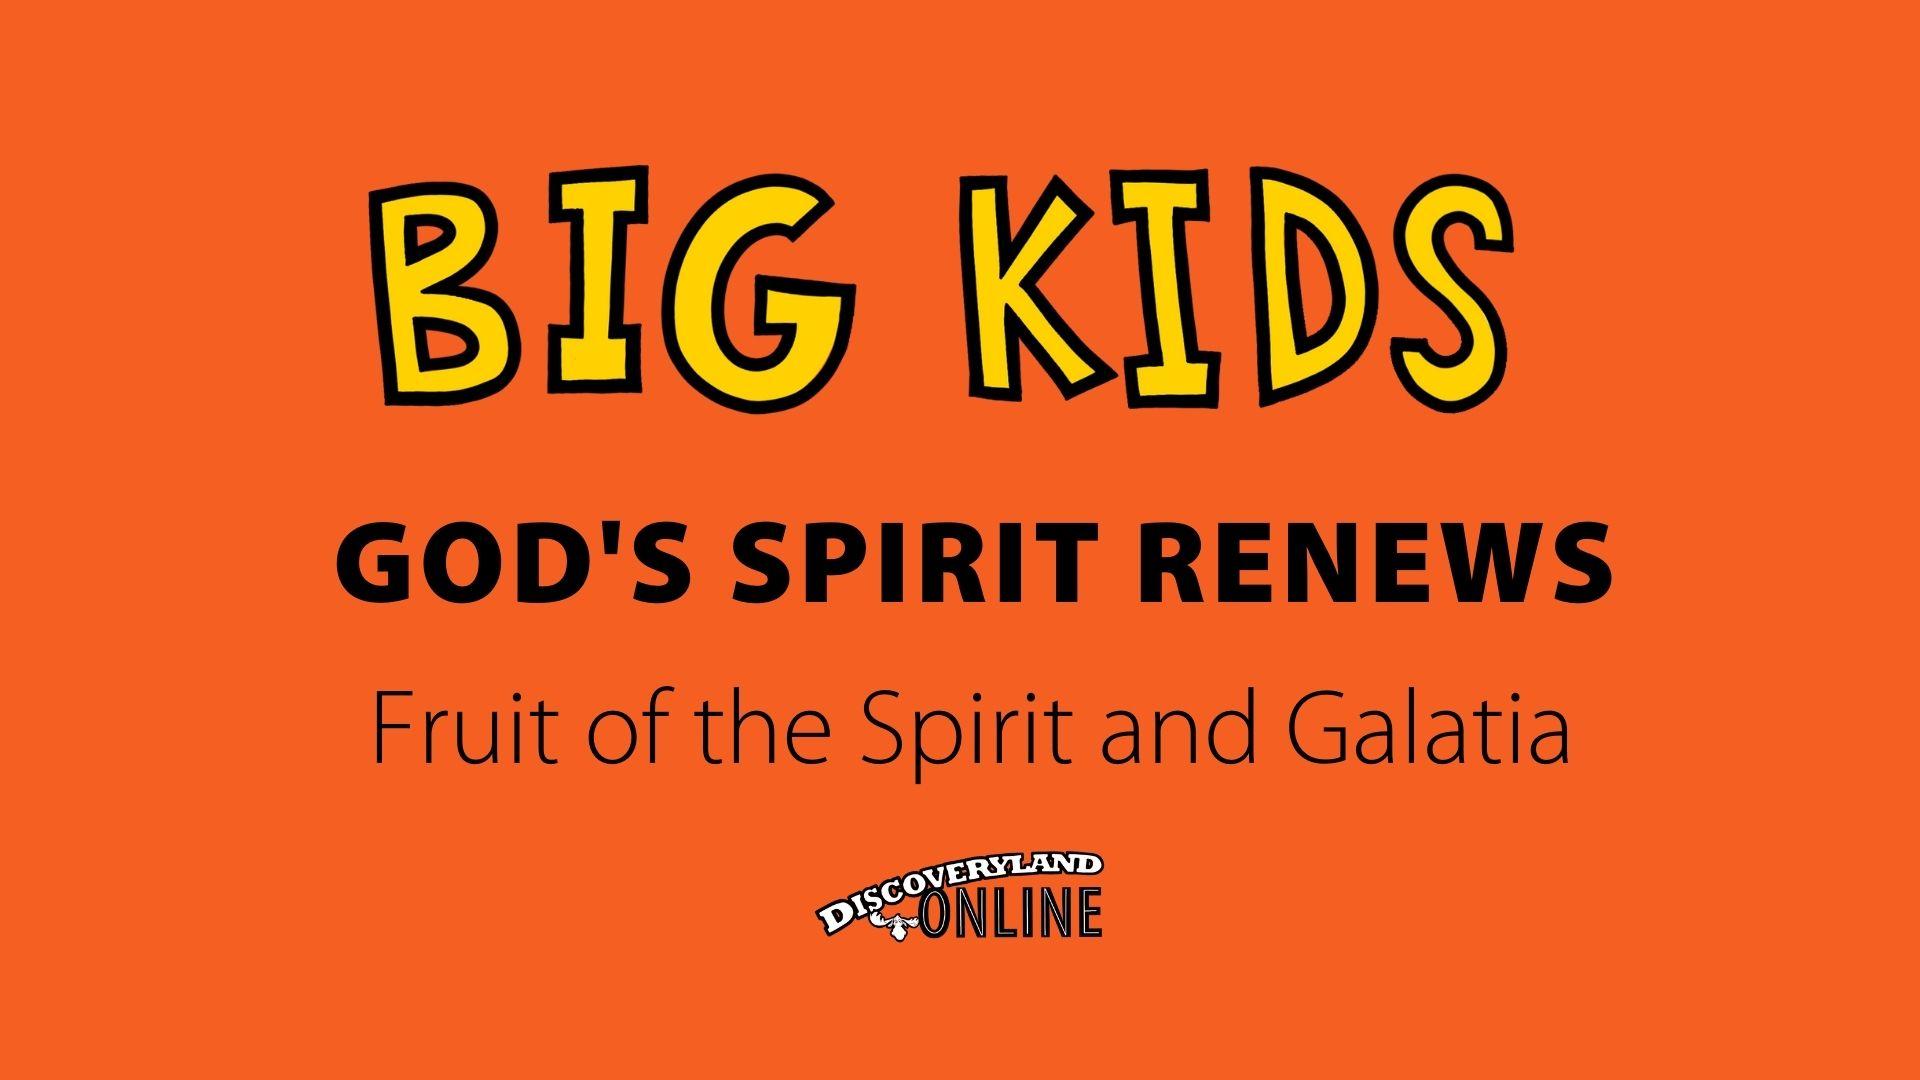 God's Spirit Renews